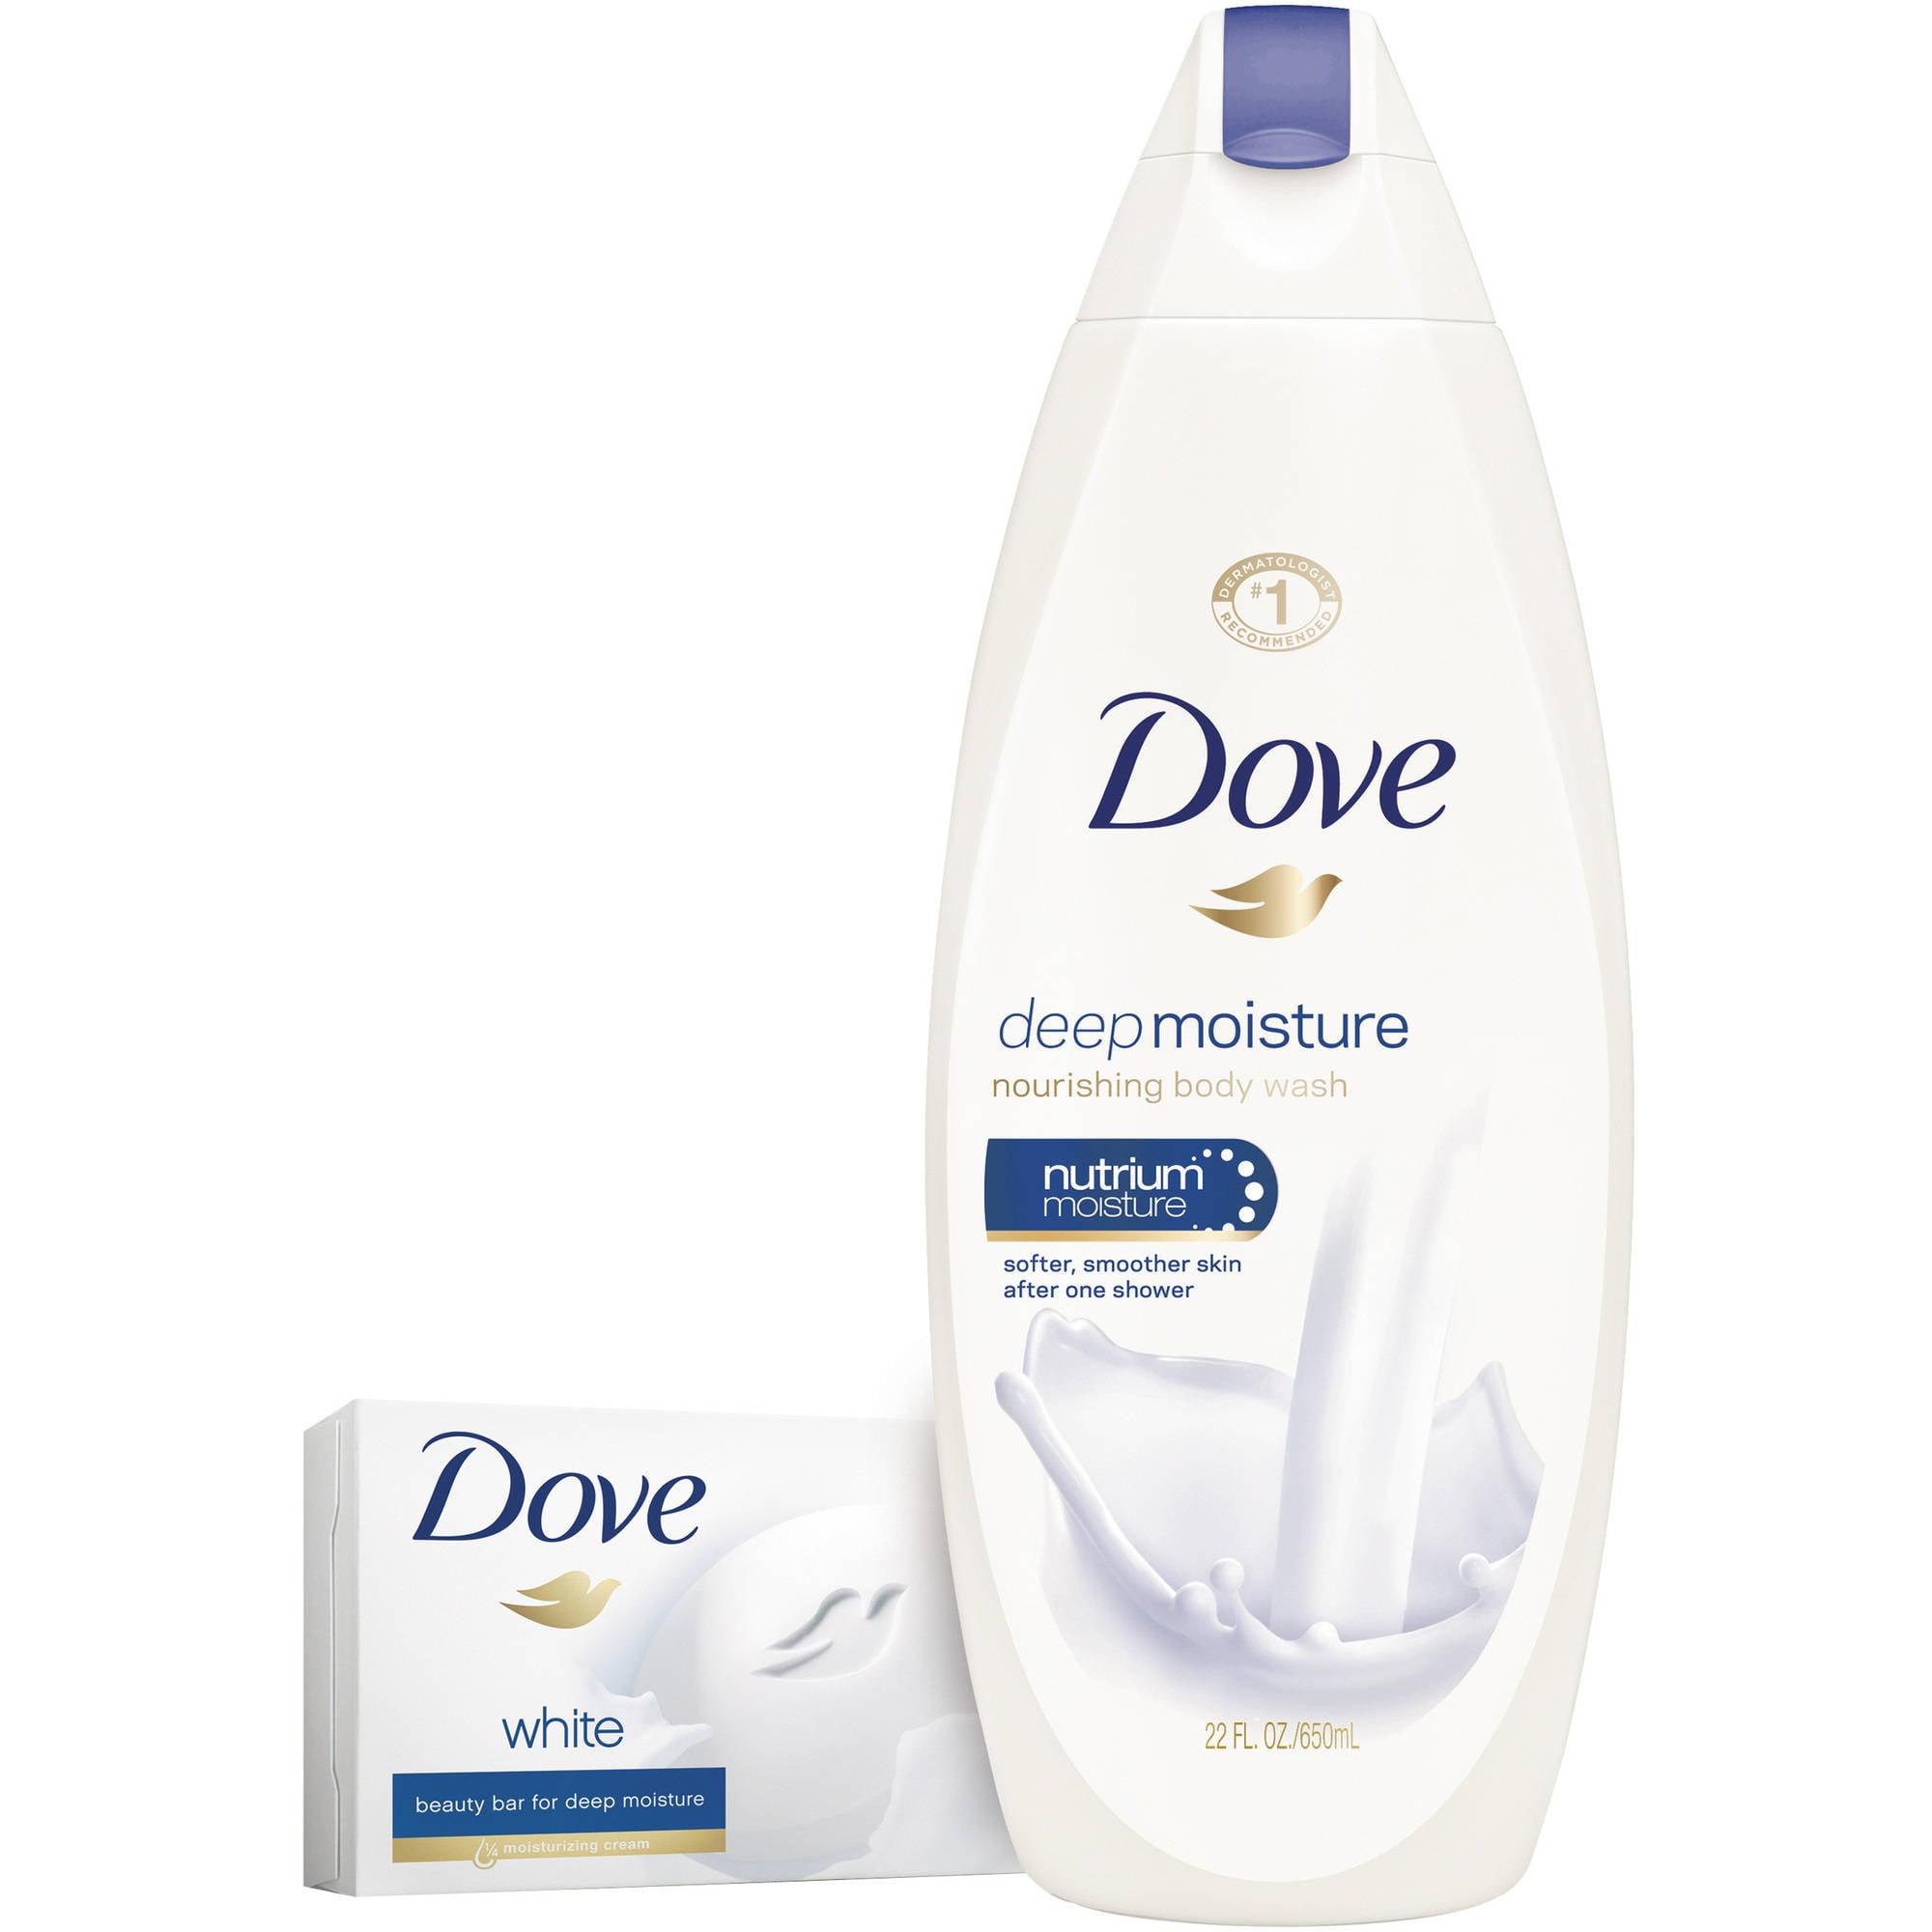 Dove Deep Moisture Sulfate Free Moisturizing Body Wash 22 Oz Pure Facial Foam 100 Gr